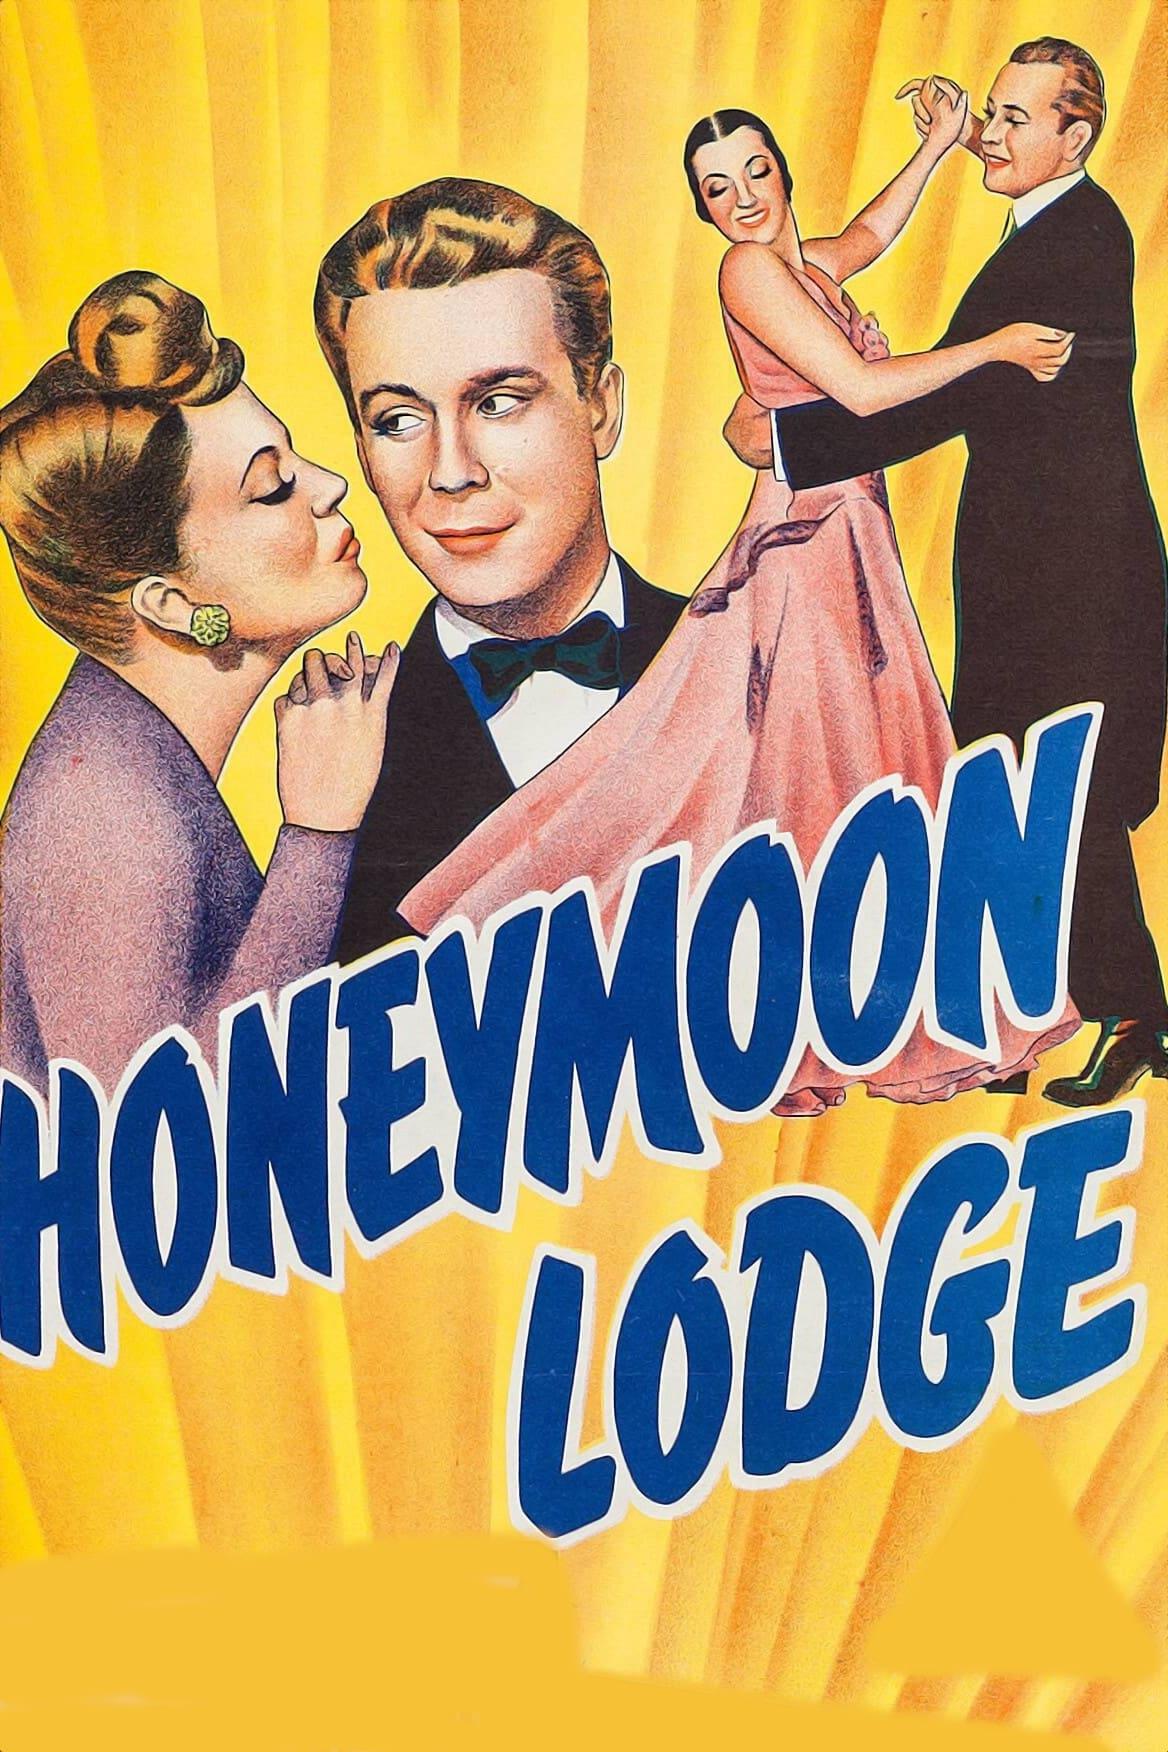 Honeymoon Lodge